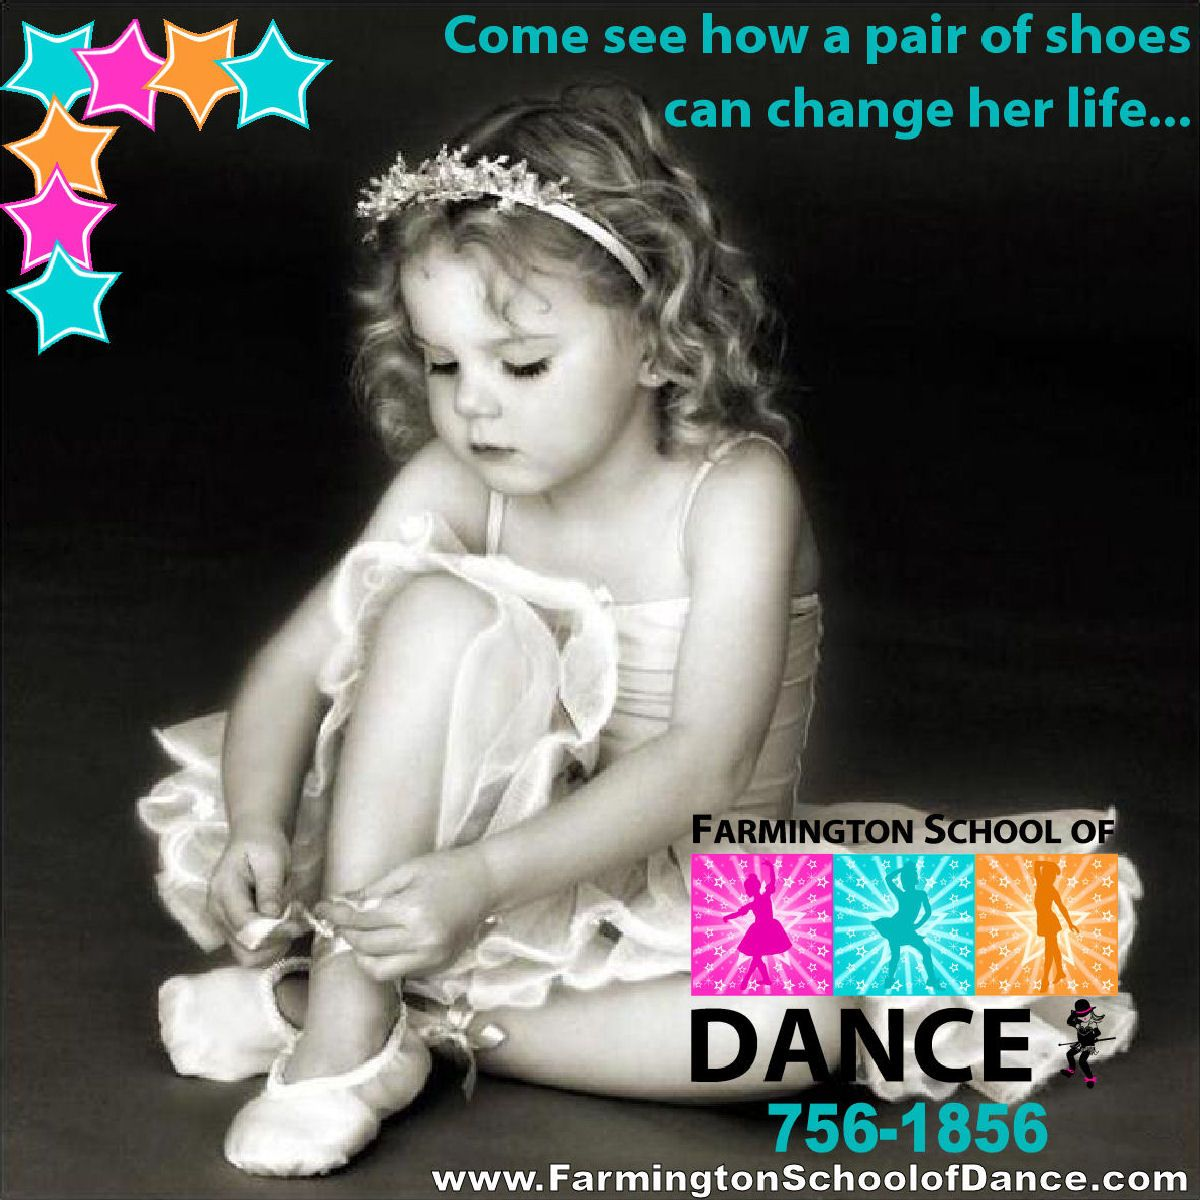 Farmington School Of Dance Dance Studio Dance Farmington